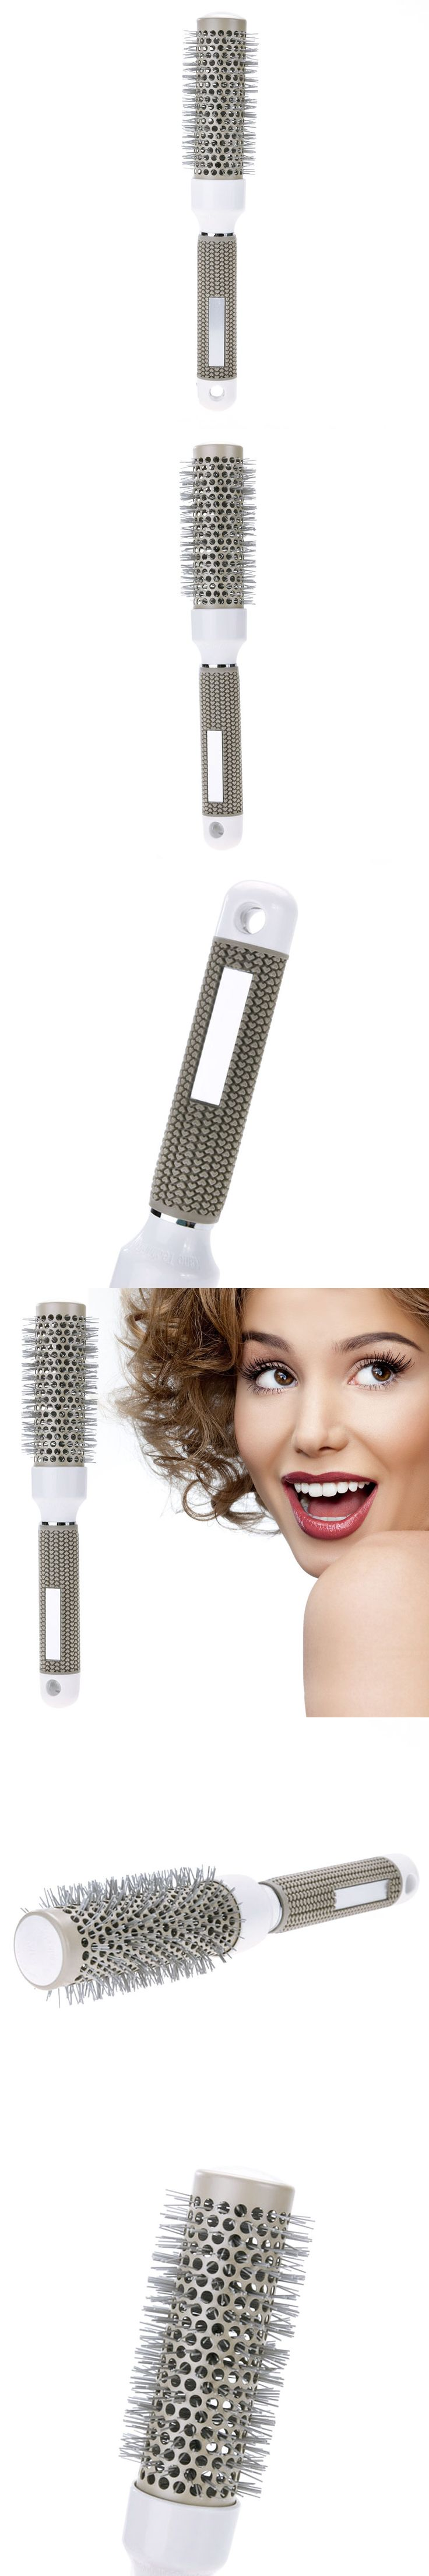 32mm  Ceramic Iron Round Comb Hair Dressing Brush Salon Styling Tool Hair Care